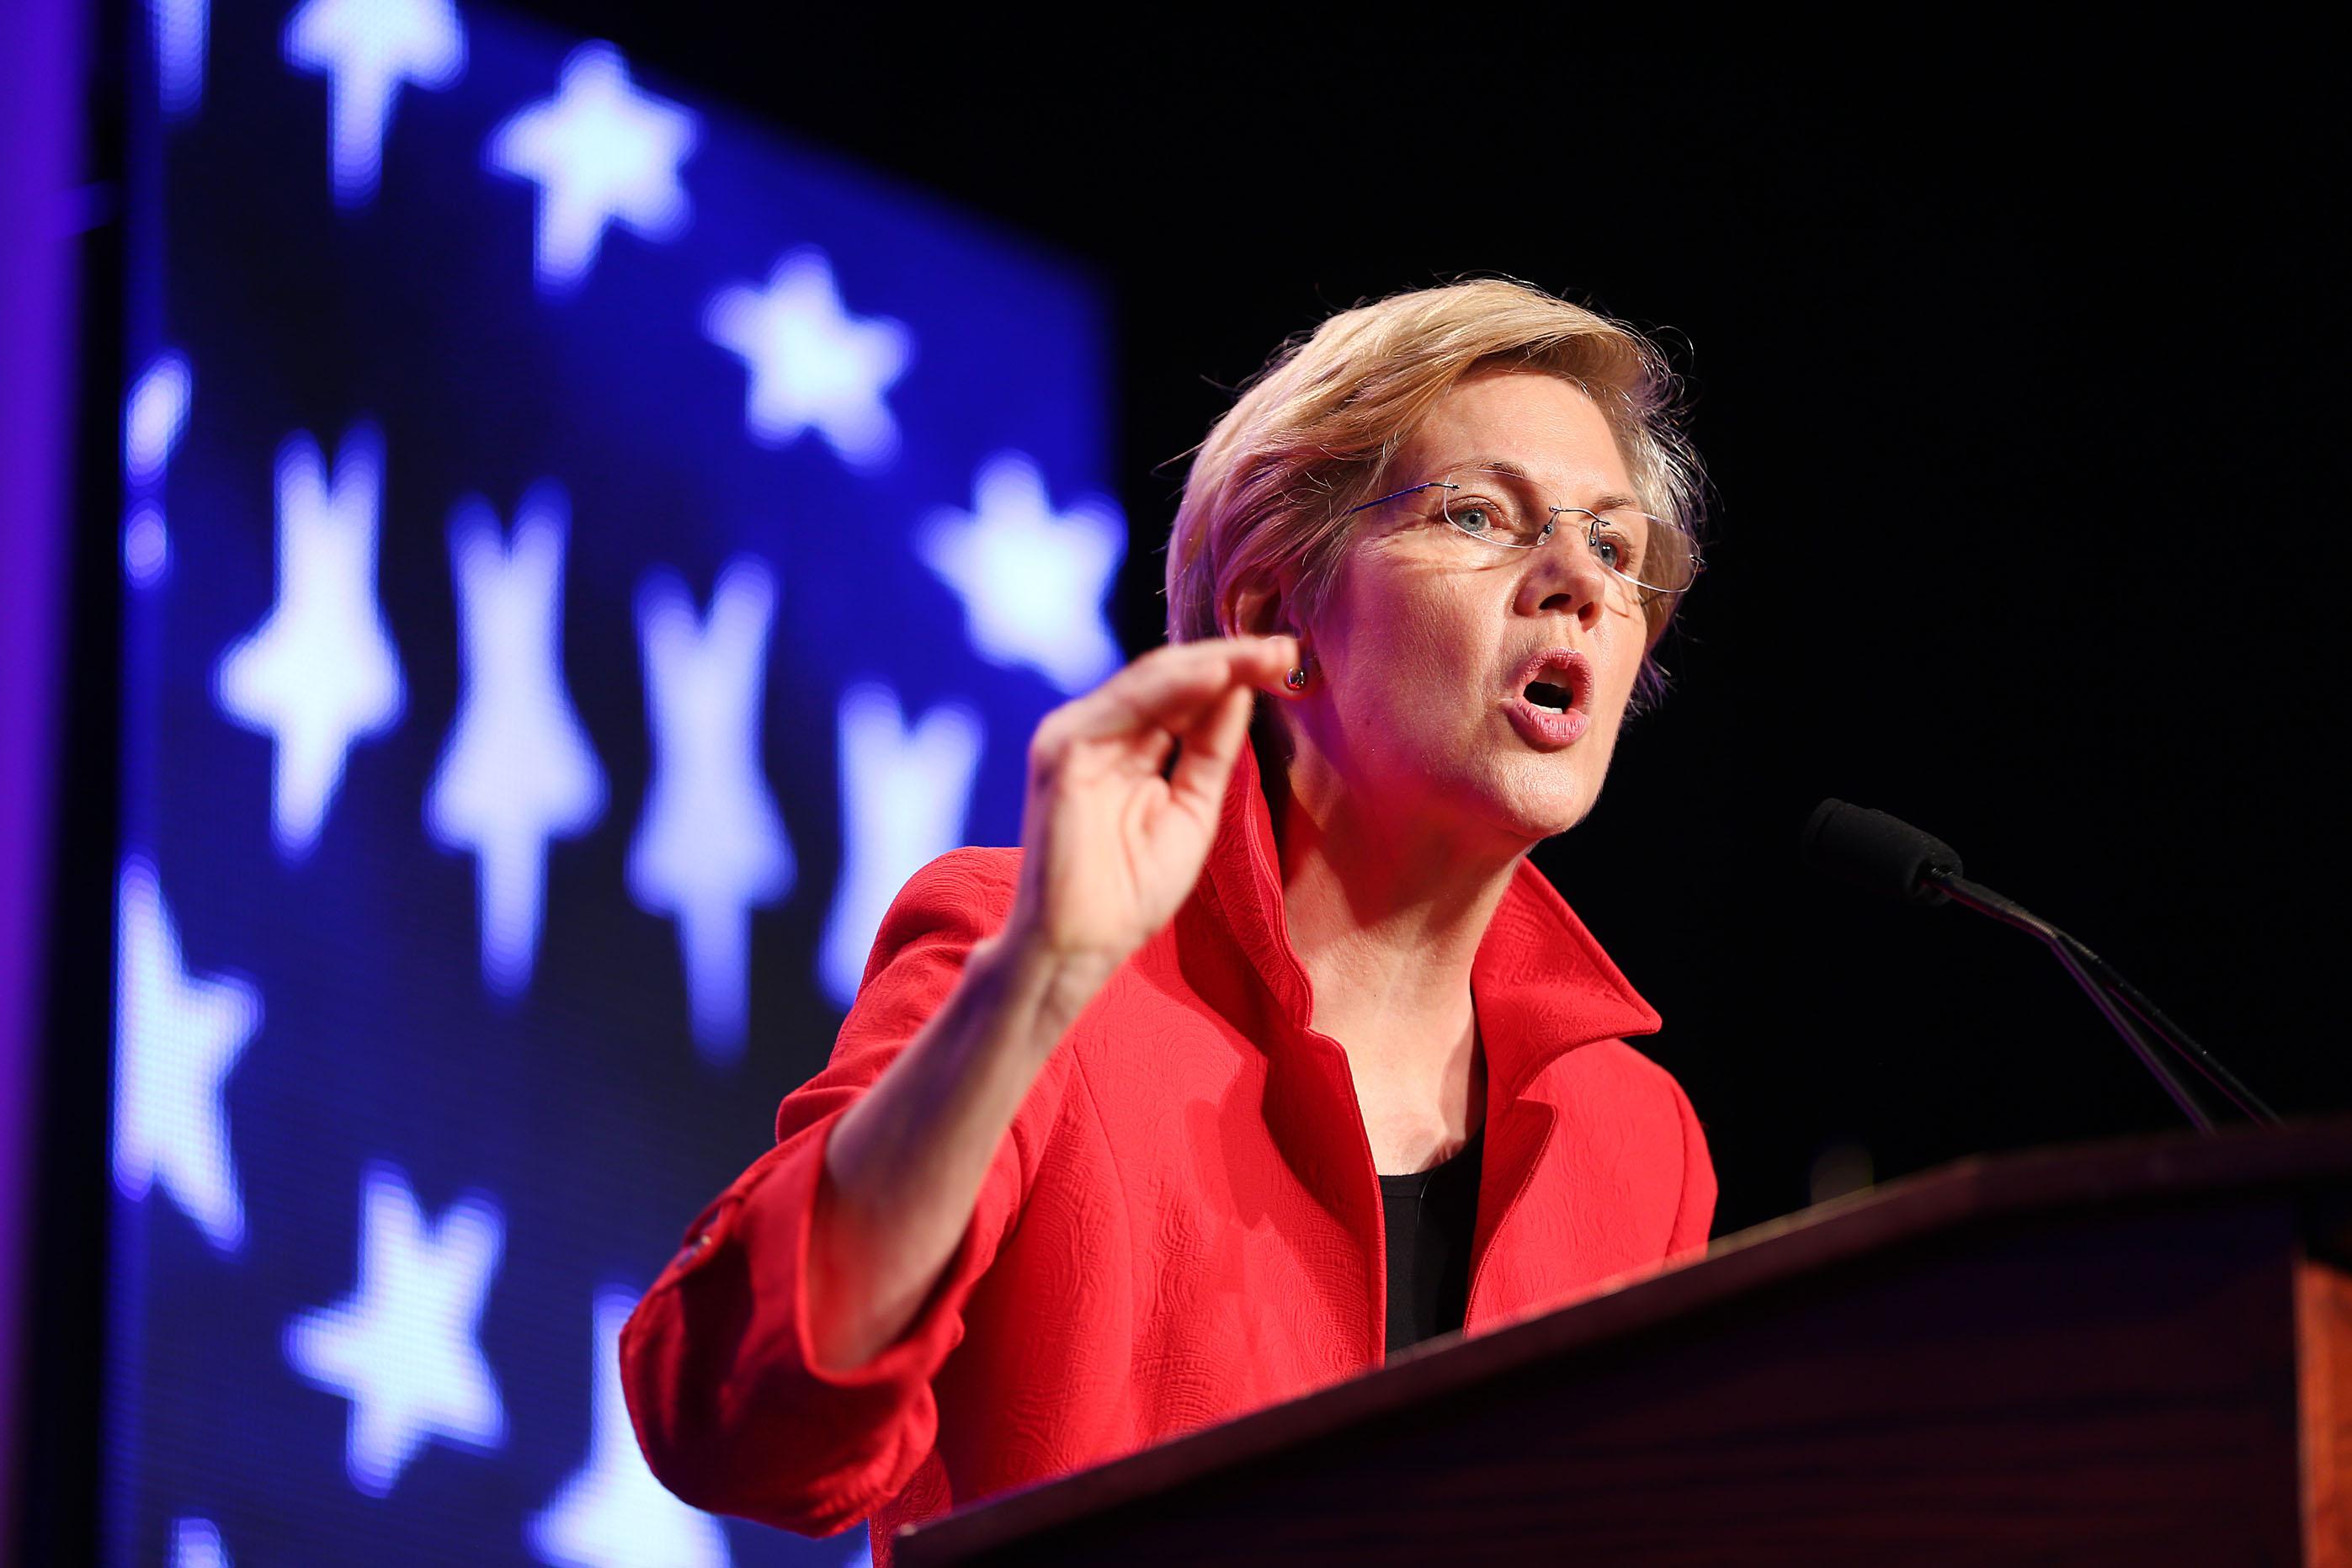 Senator Elizabeth Warren speaks at the Democratic State Convention in Worcester, Mass. on June 13.